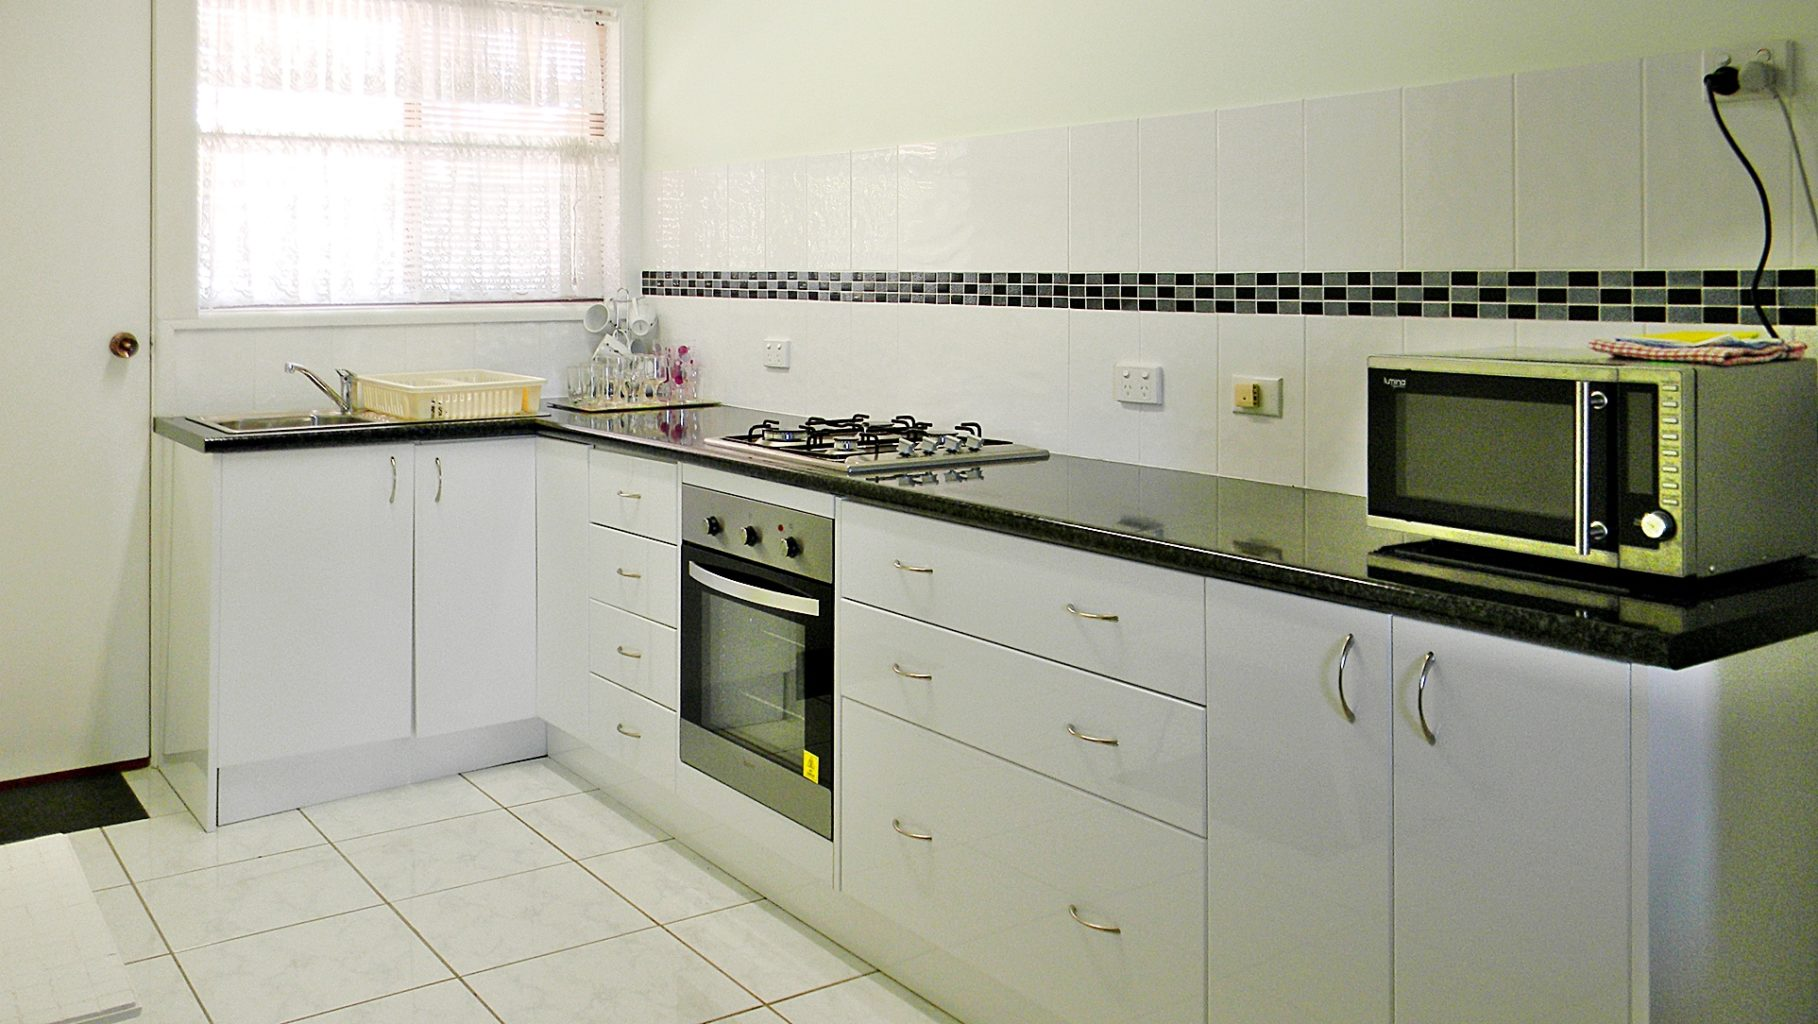 Sunseeker Kitchen